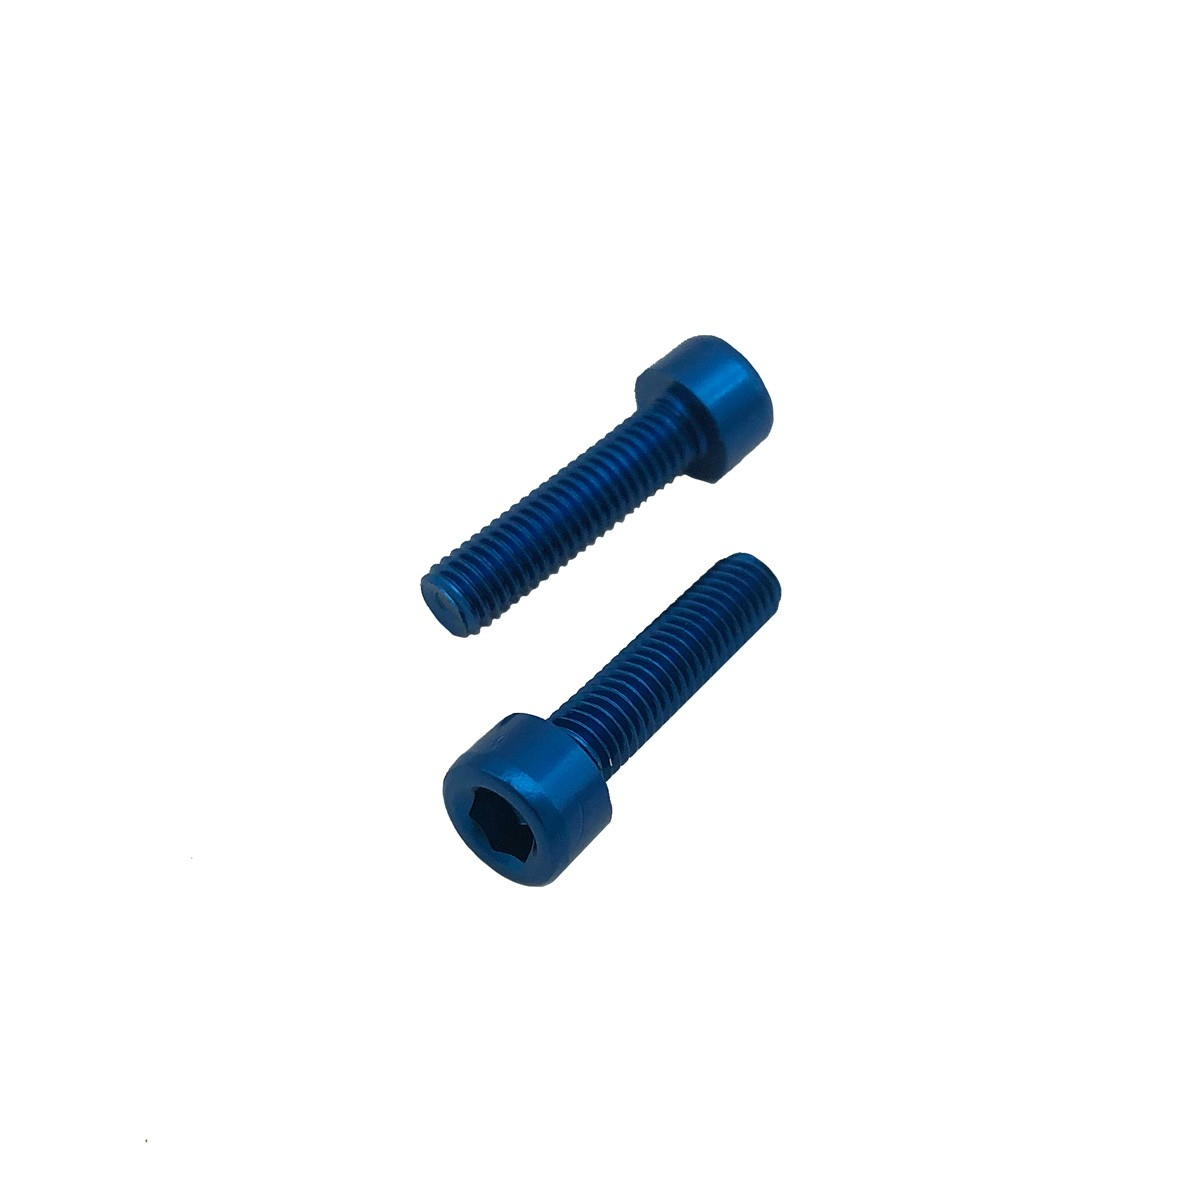 Parafuso Allen de Aluminio Socket Cap M5 x 12mm Unidade Azul